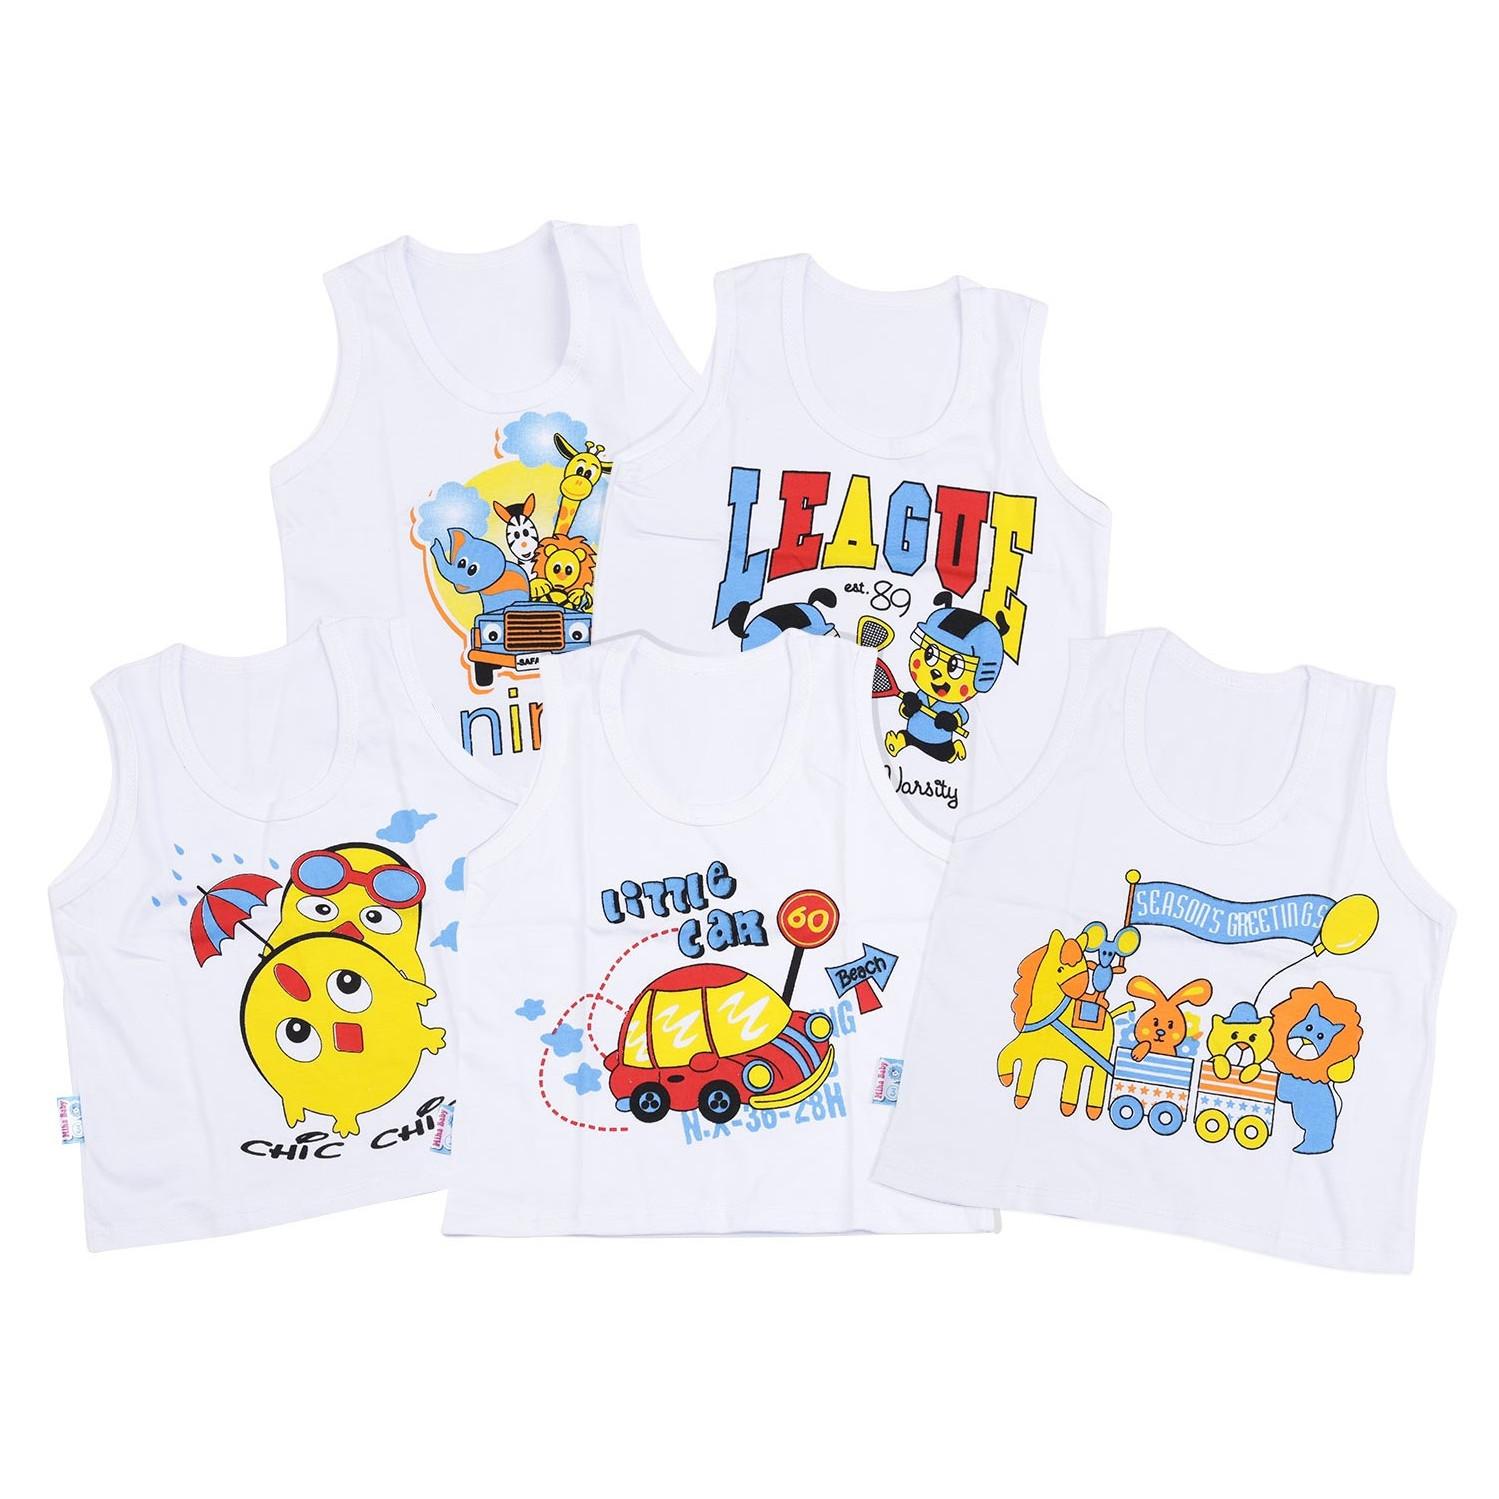 Combo 5 áo ba lỗ trắng cho bé(3-15kg)